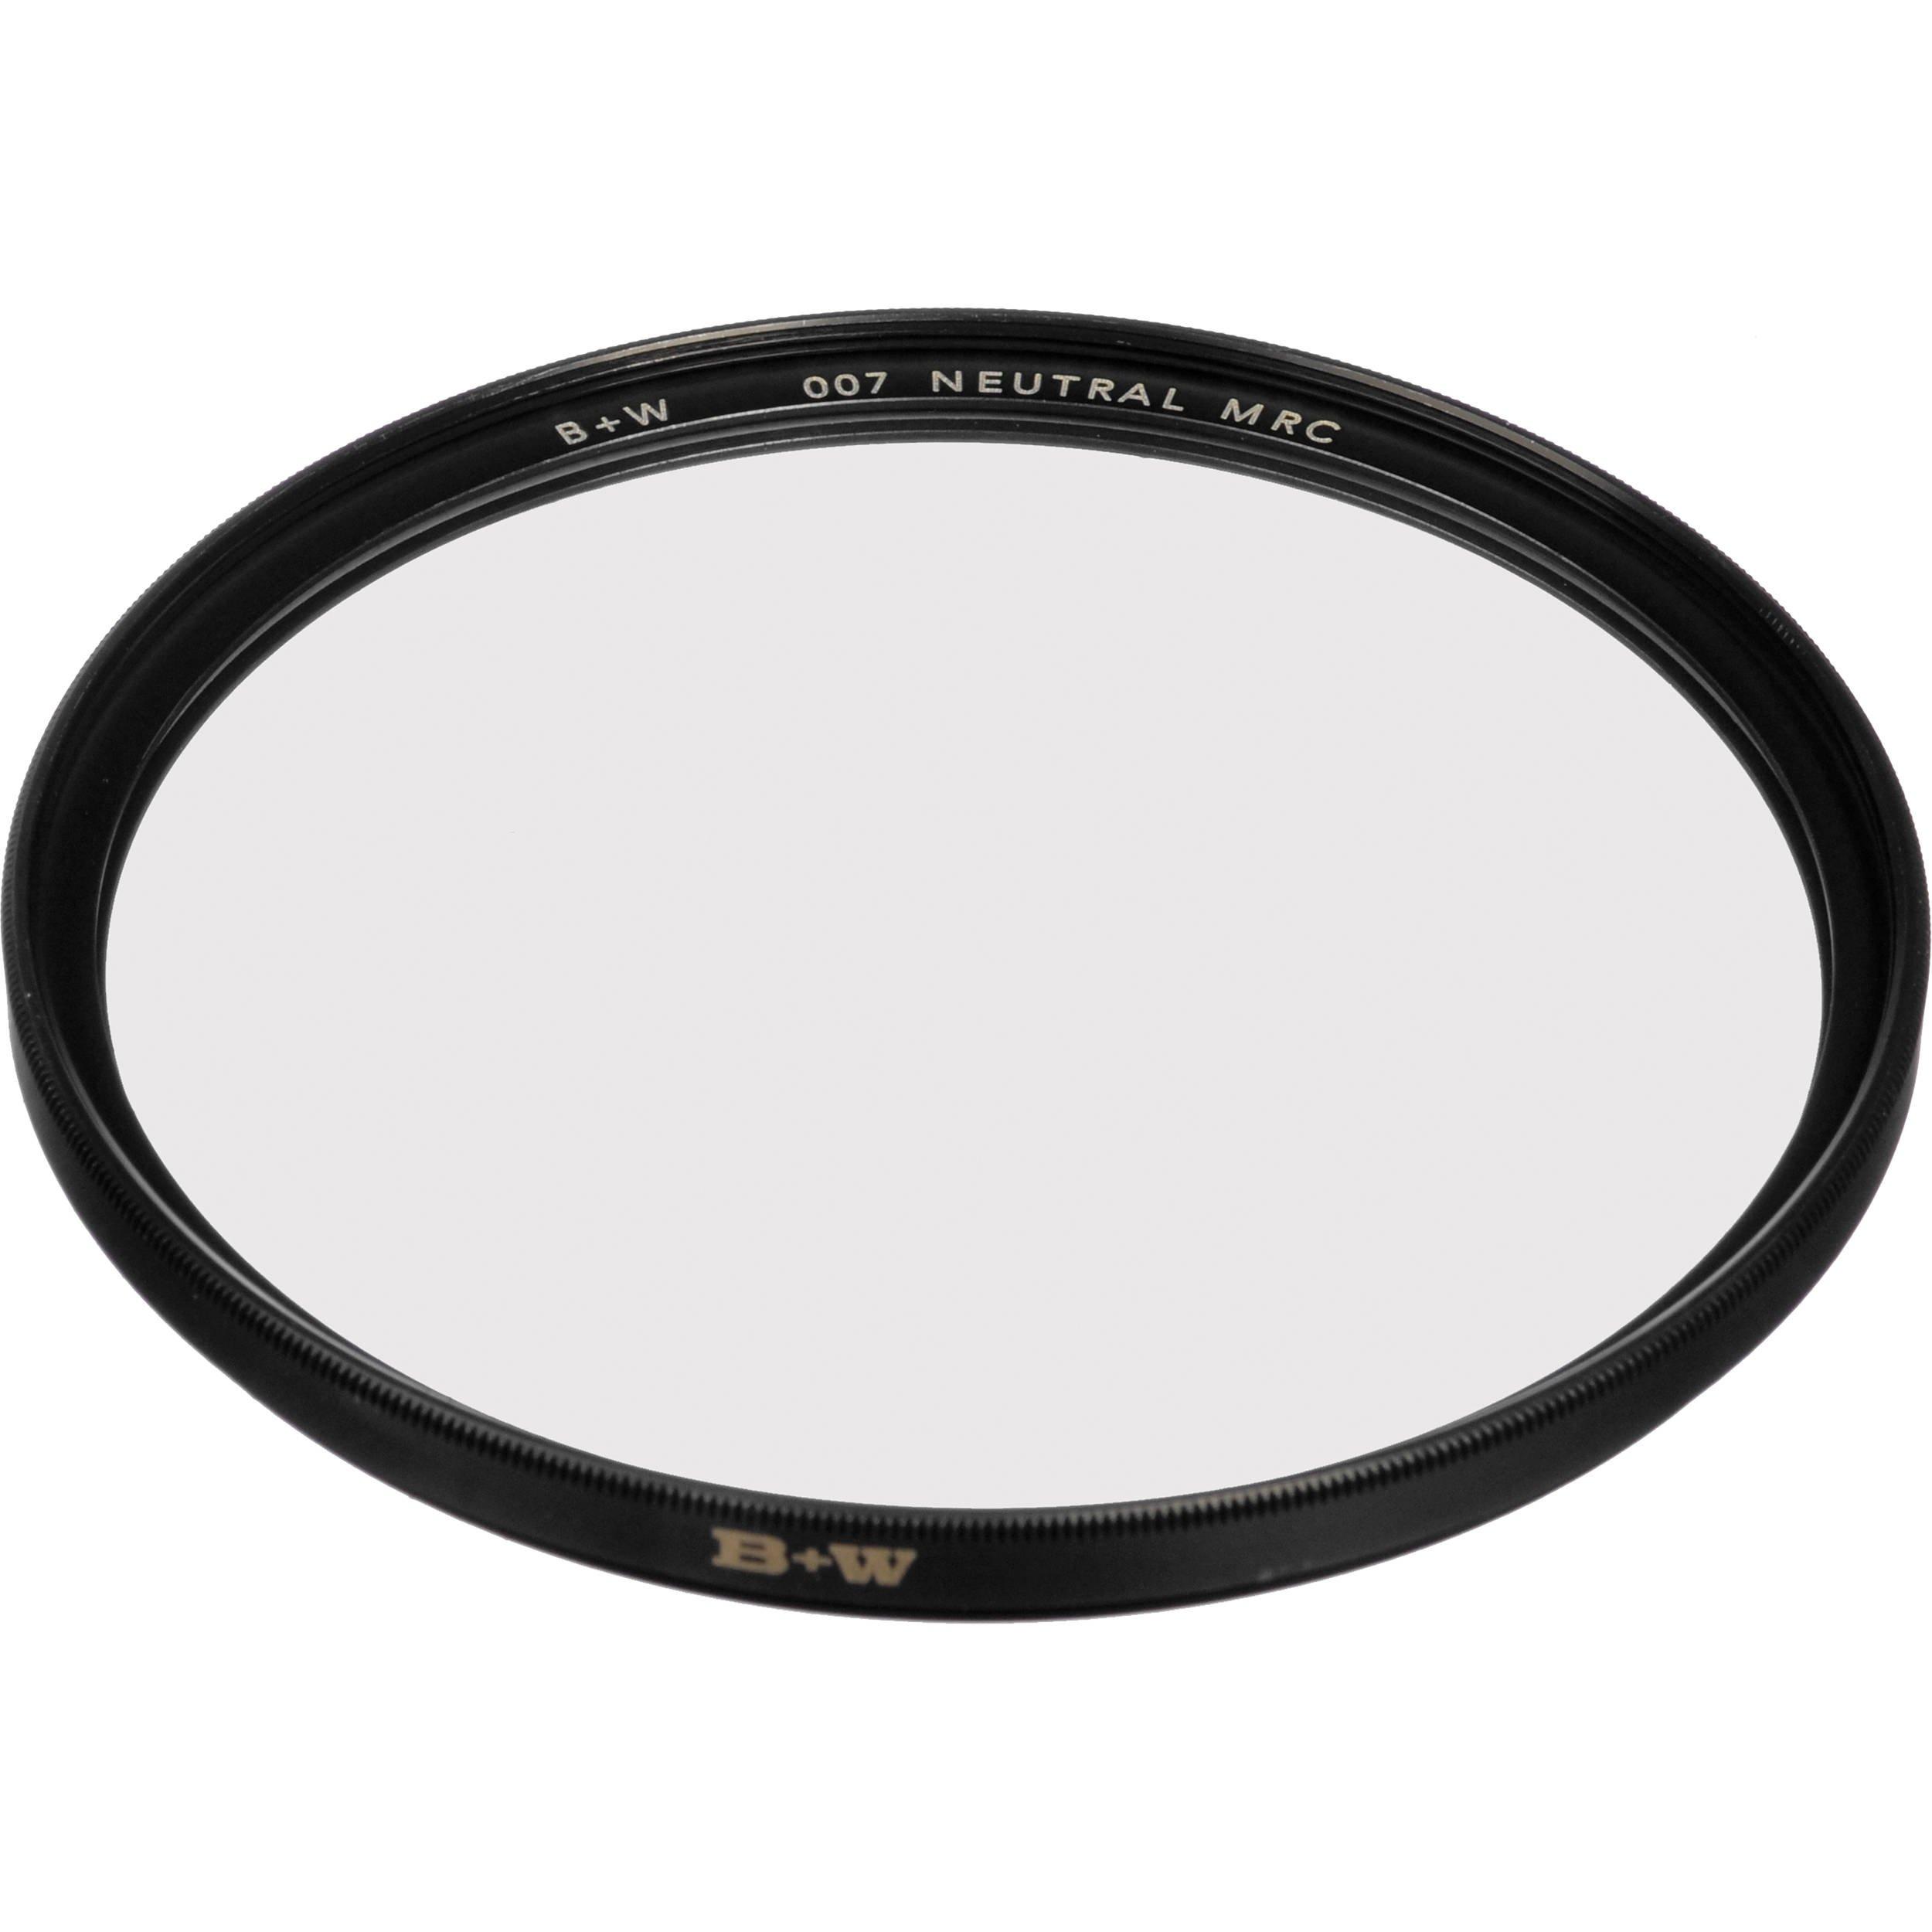 B+W filtr ochranný neutrální 007M MRC 49mm